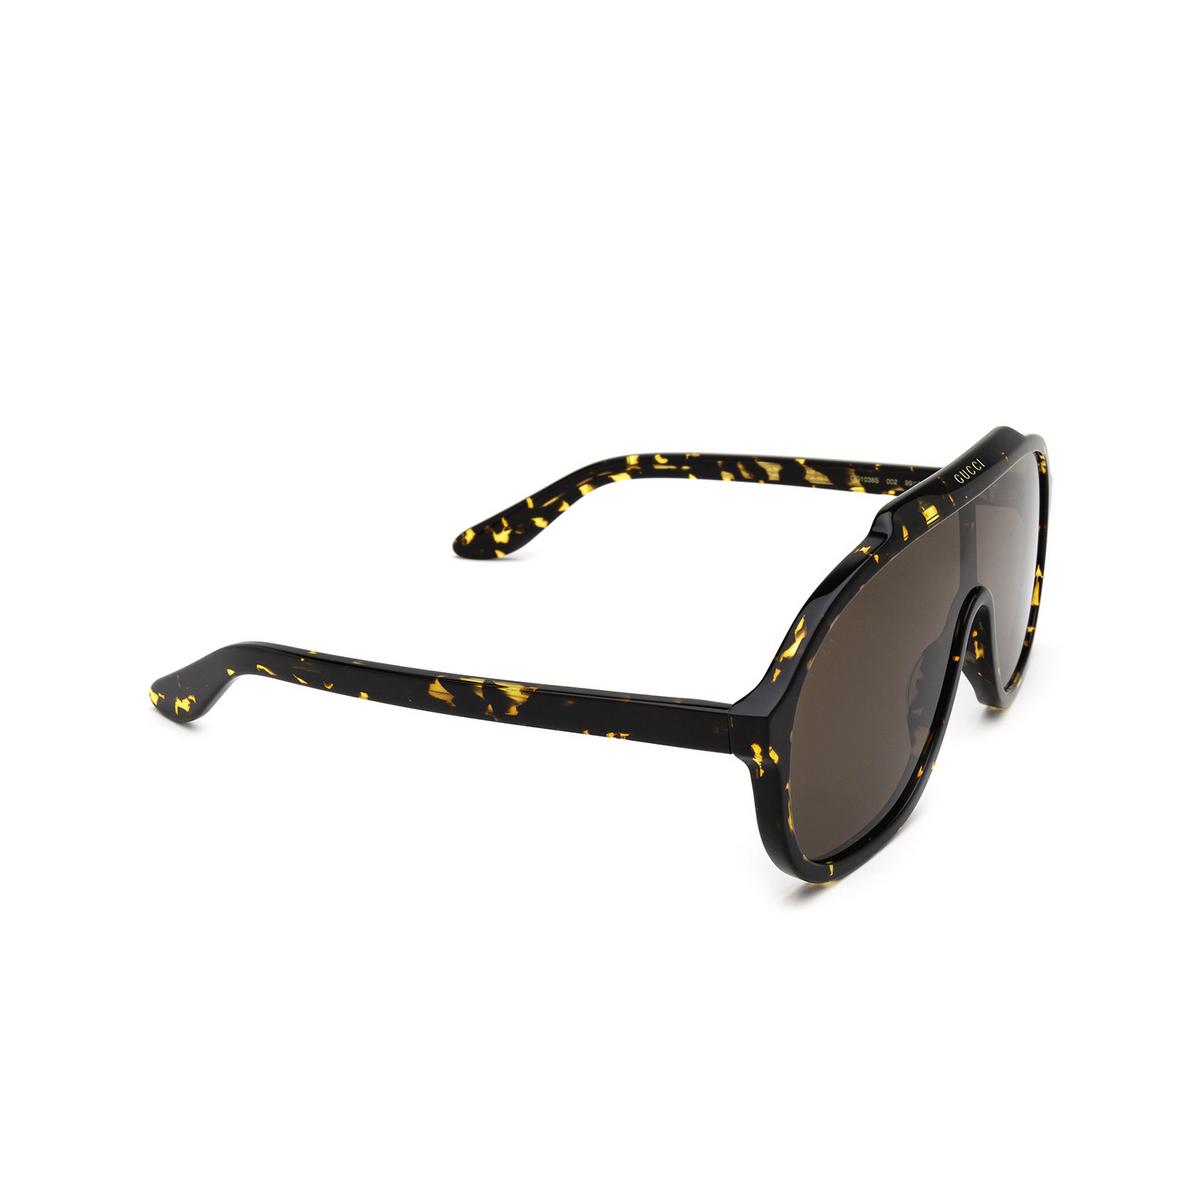 Gucci® Mask Sunglasses: GG1038S color Havana 002 - three-quarters view.